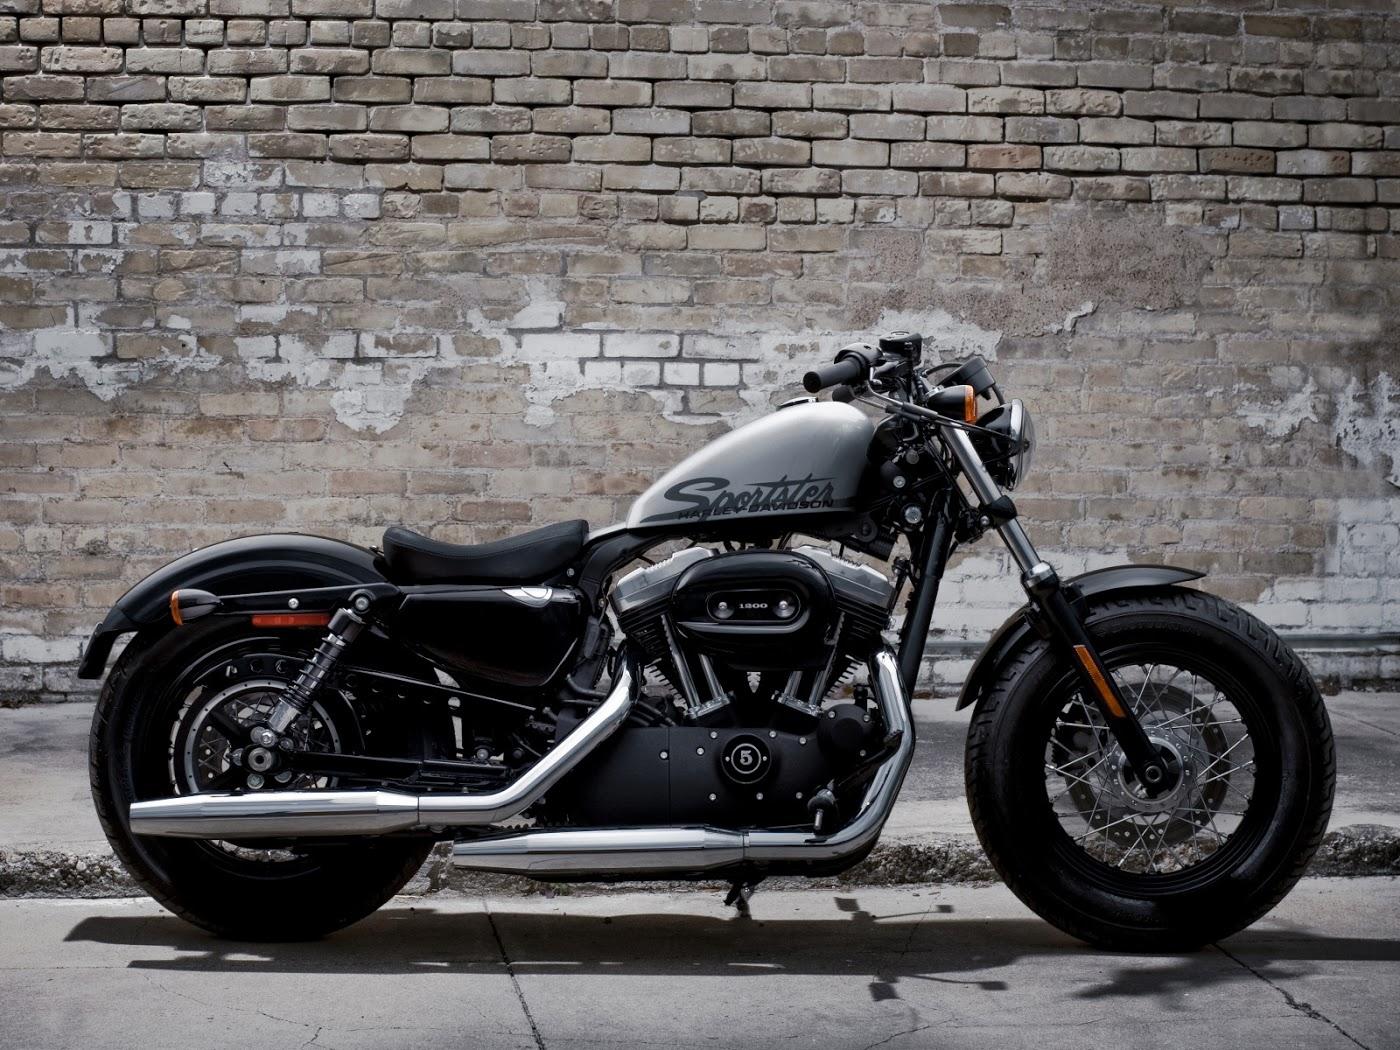 Davidson XL 1200 X Sportster Forty Eight   Harley Davidson Wallpaper 1400x1050